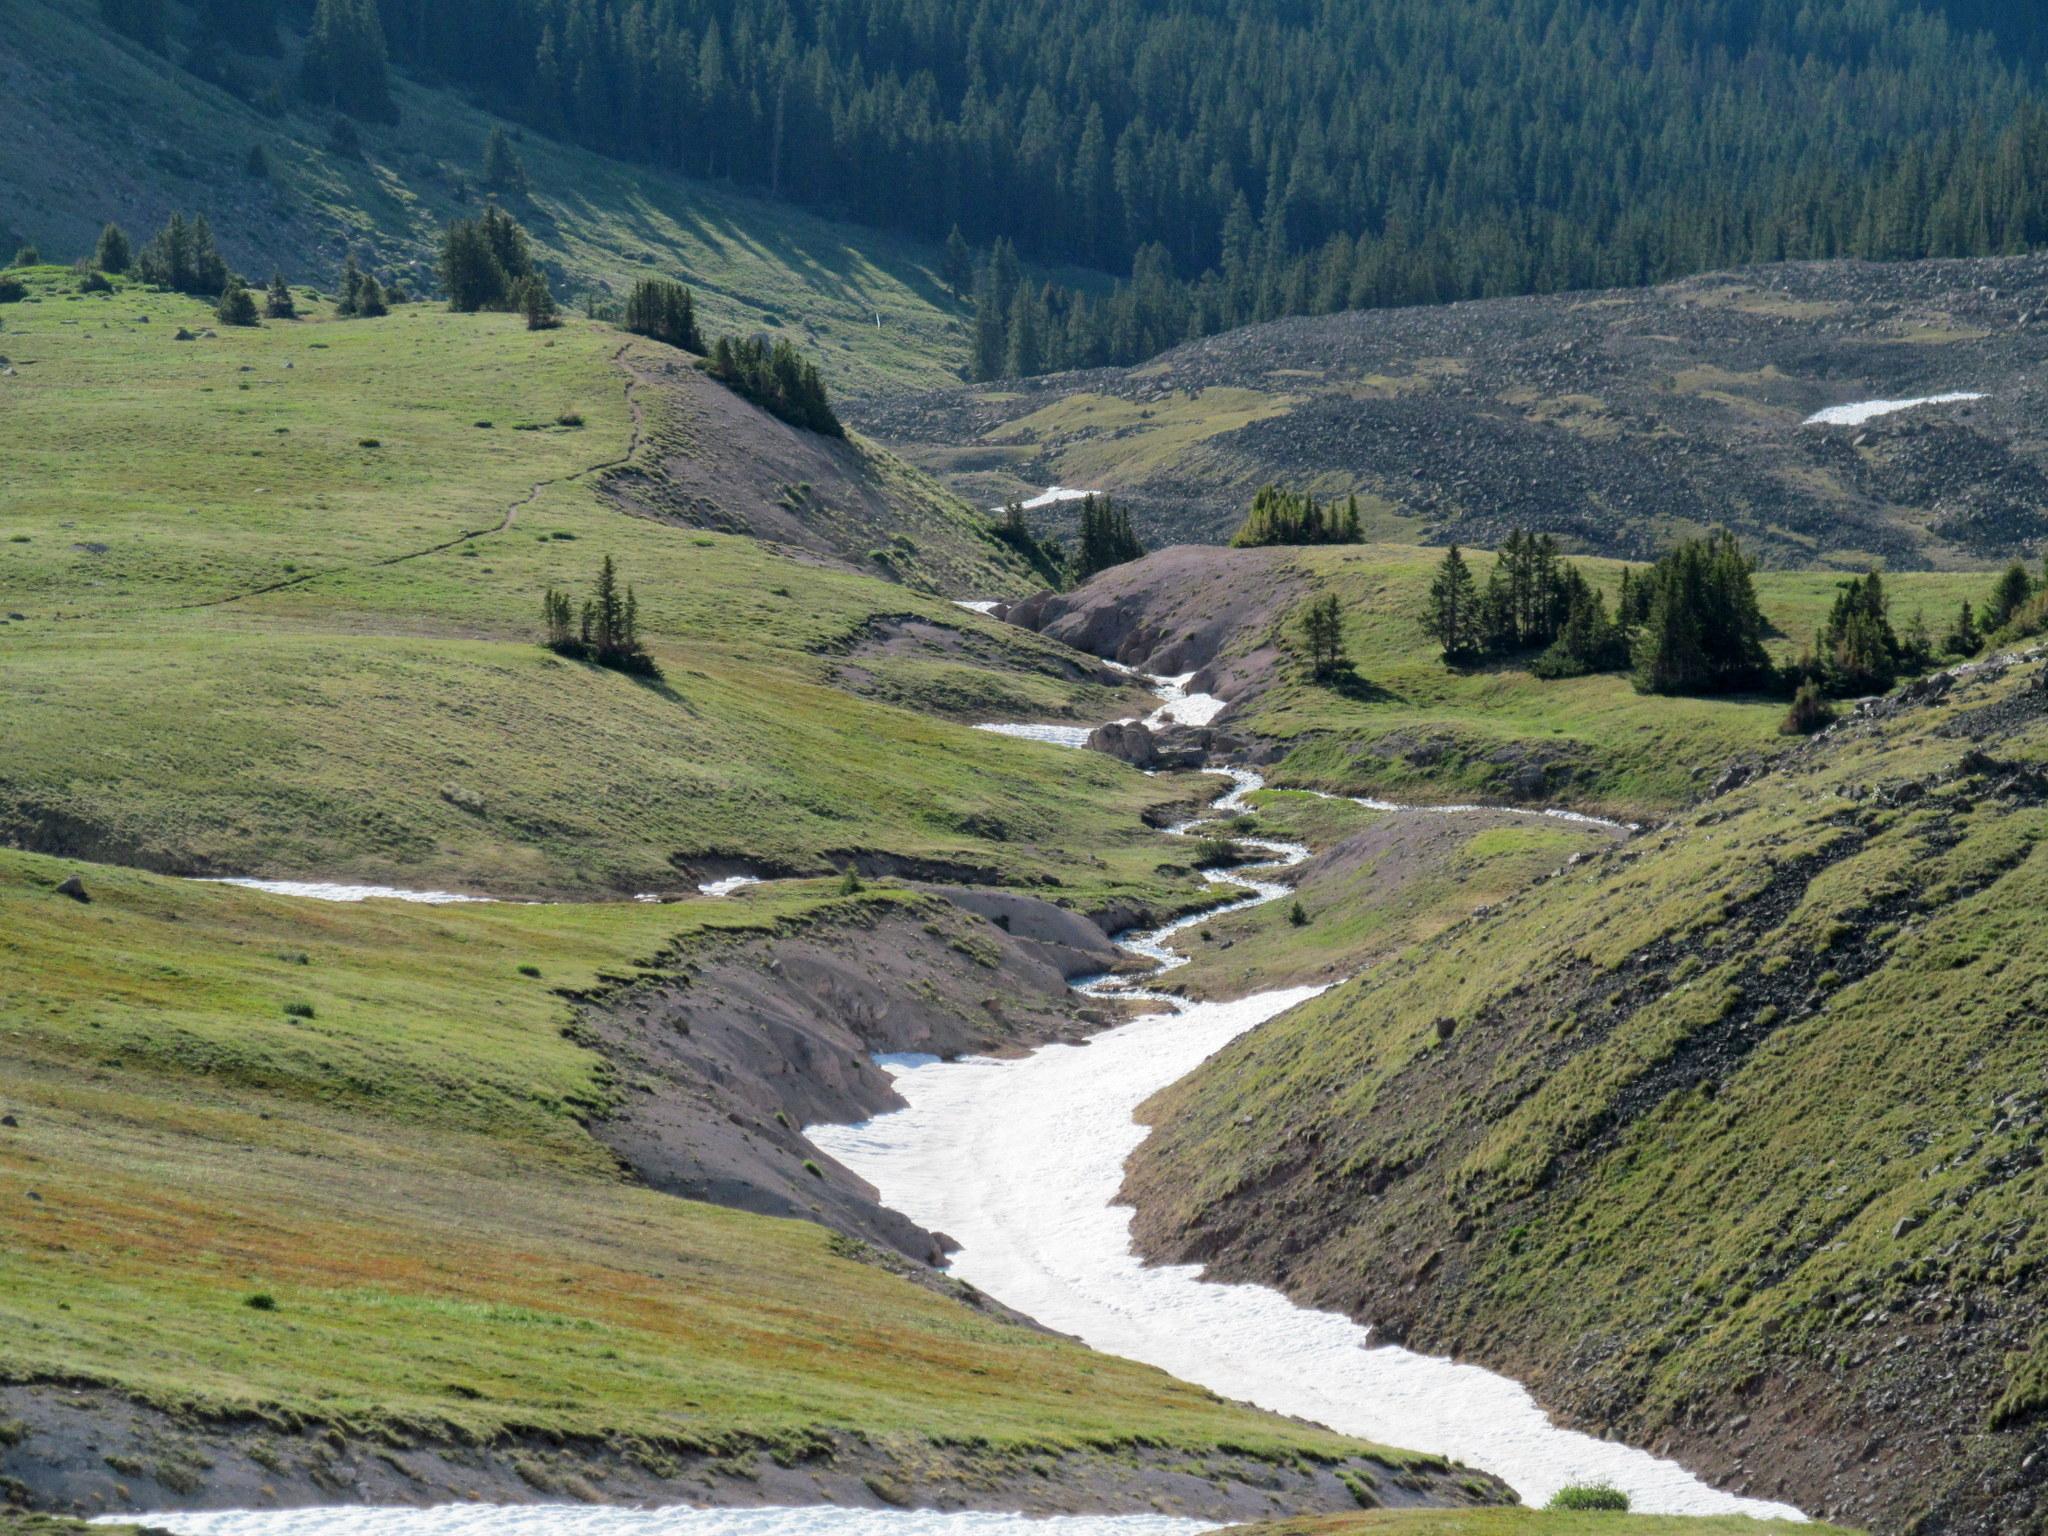 Photo: Upper Nellie Creek